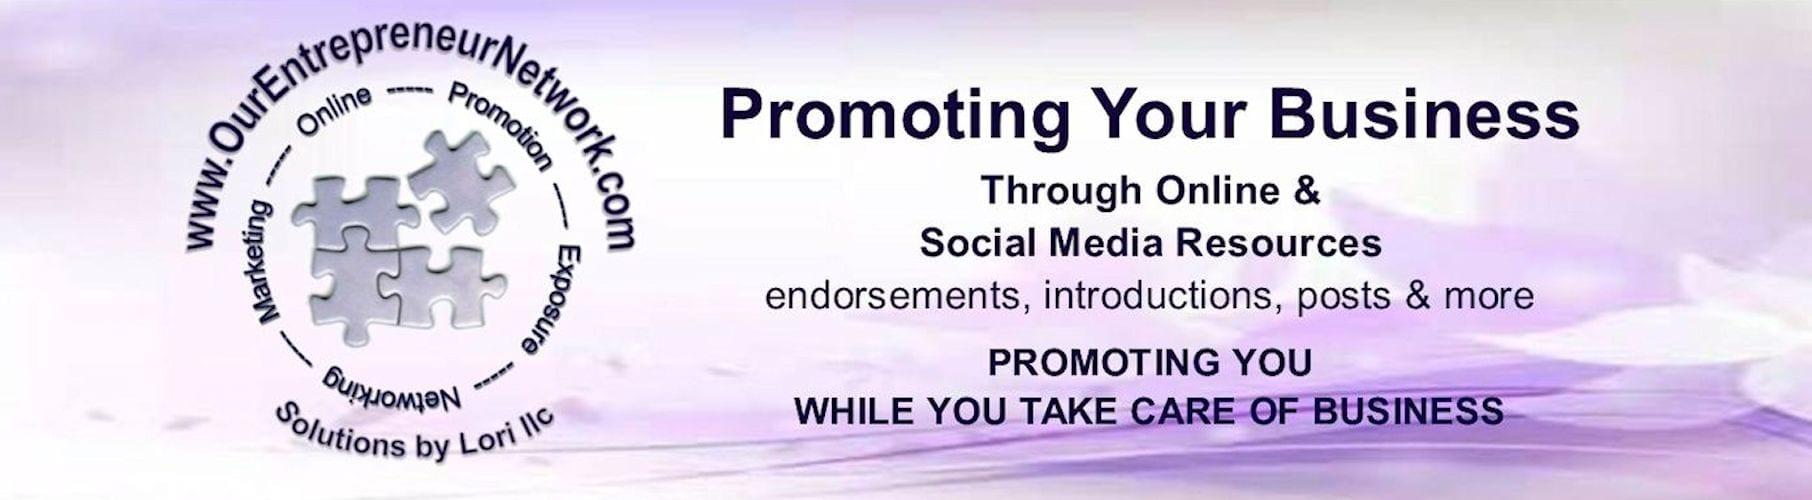 Our Entrepreneur Network